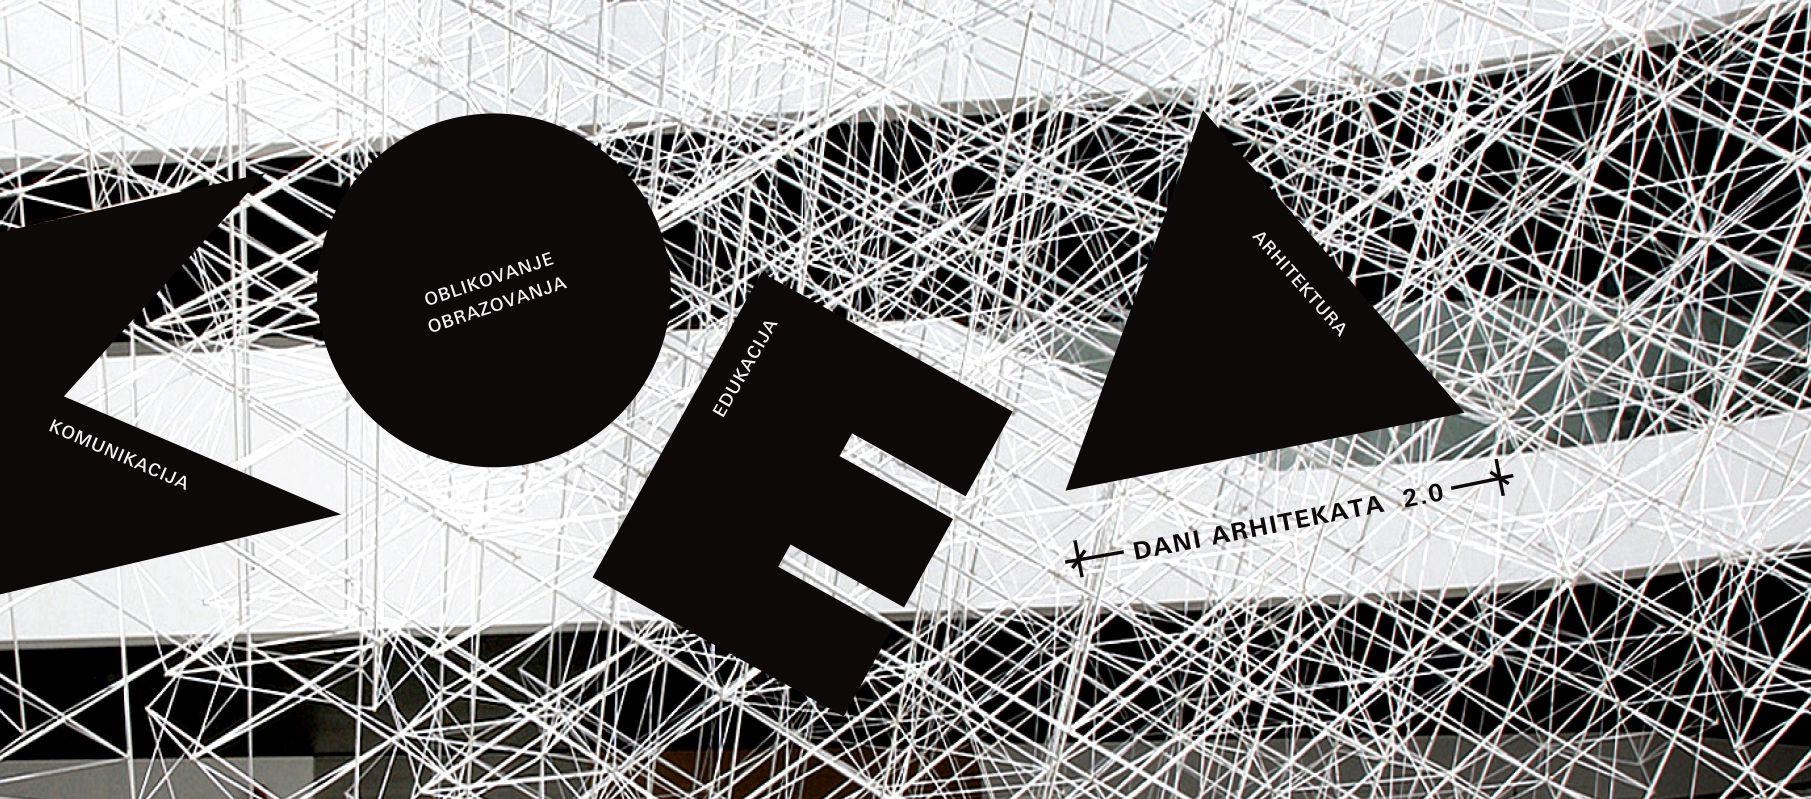 Danske zvijezde iz studija CEBRA na Danima arhitekata 2.0